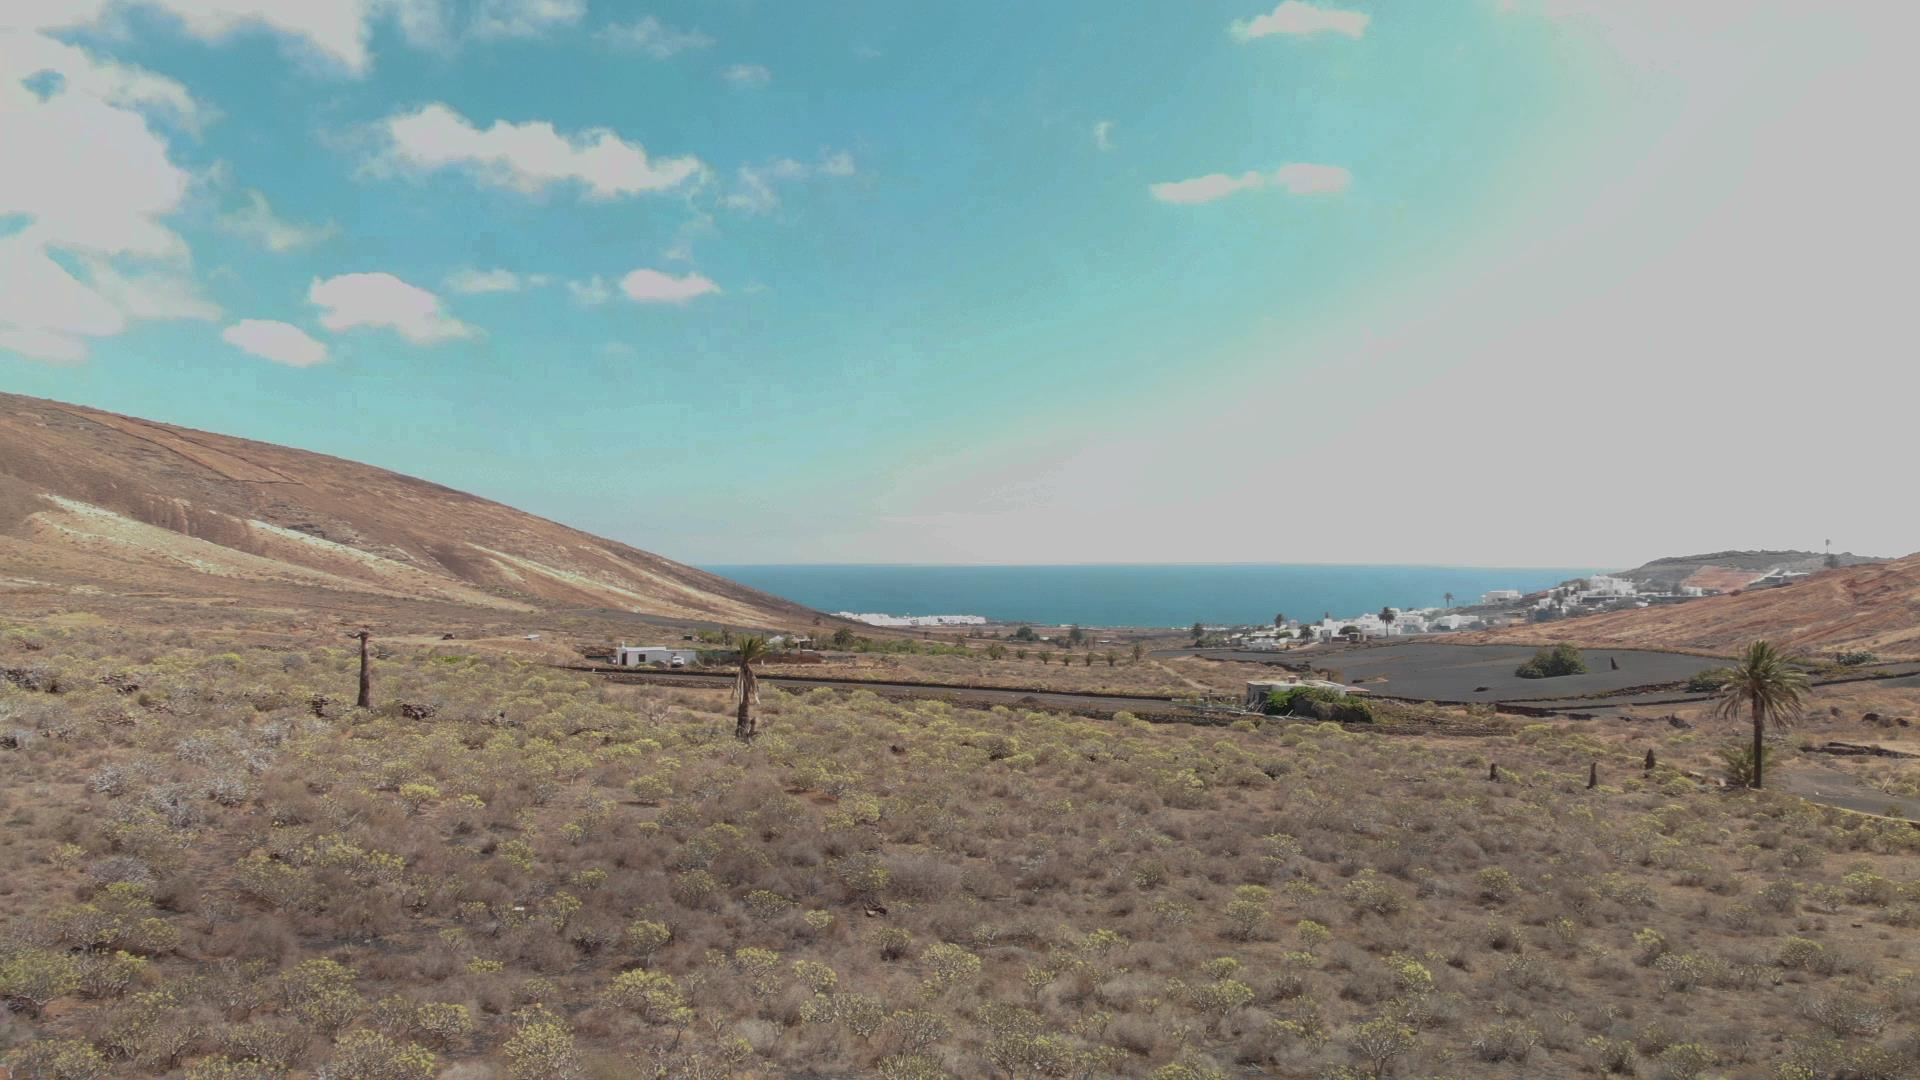 YouTube 190918 Tabayesco 1 Valle de Temisa 0227 0229